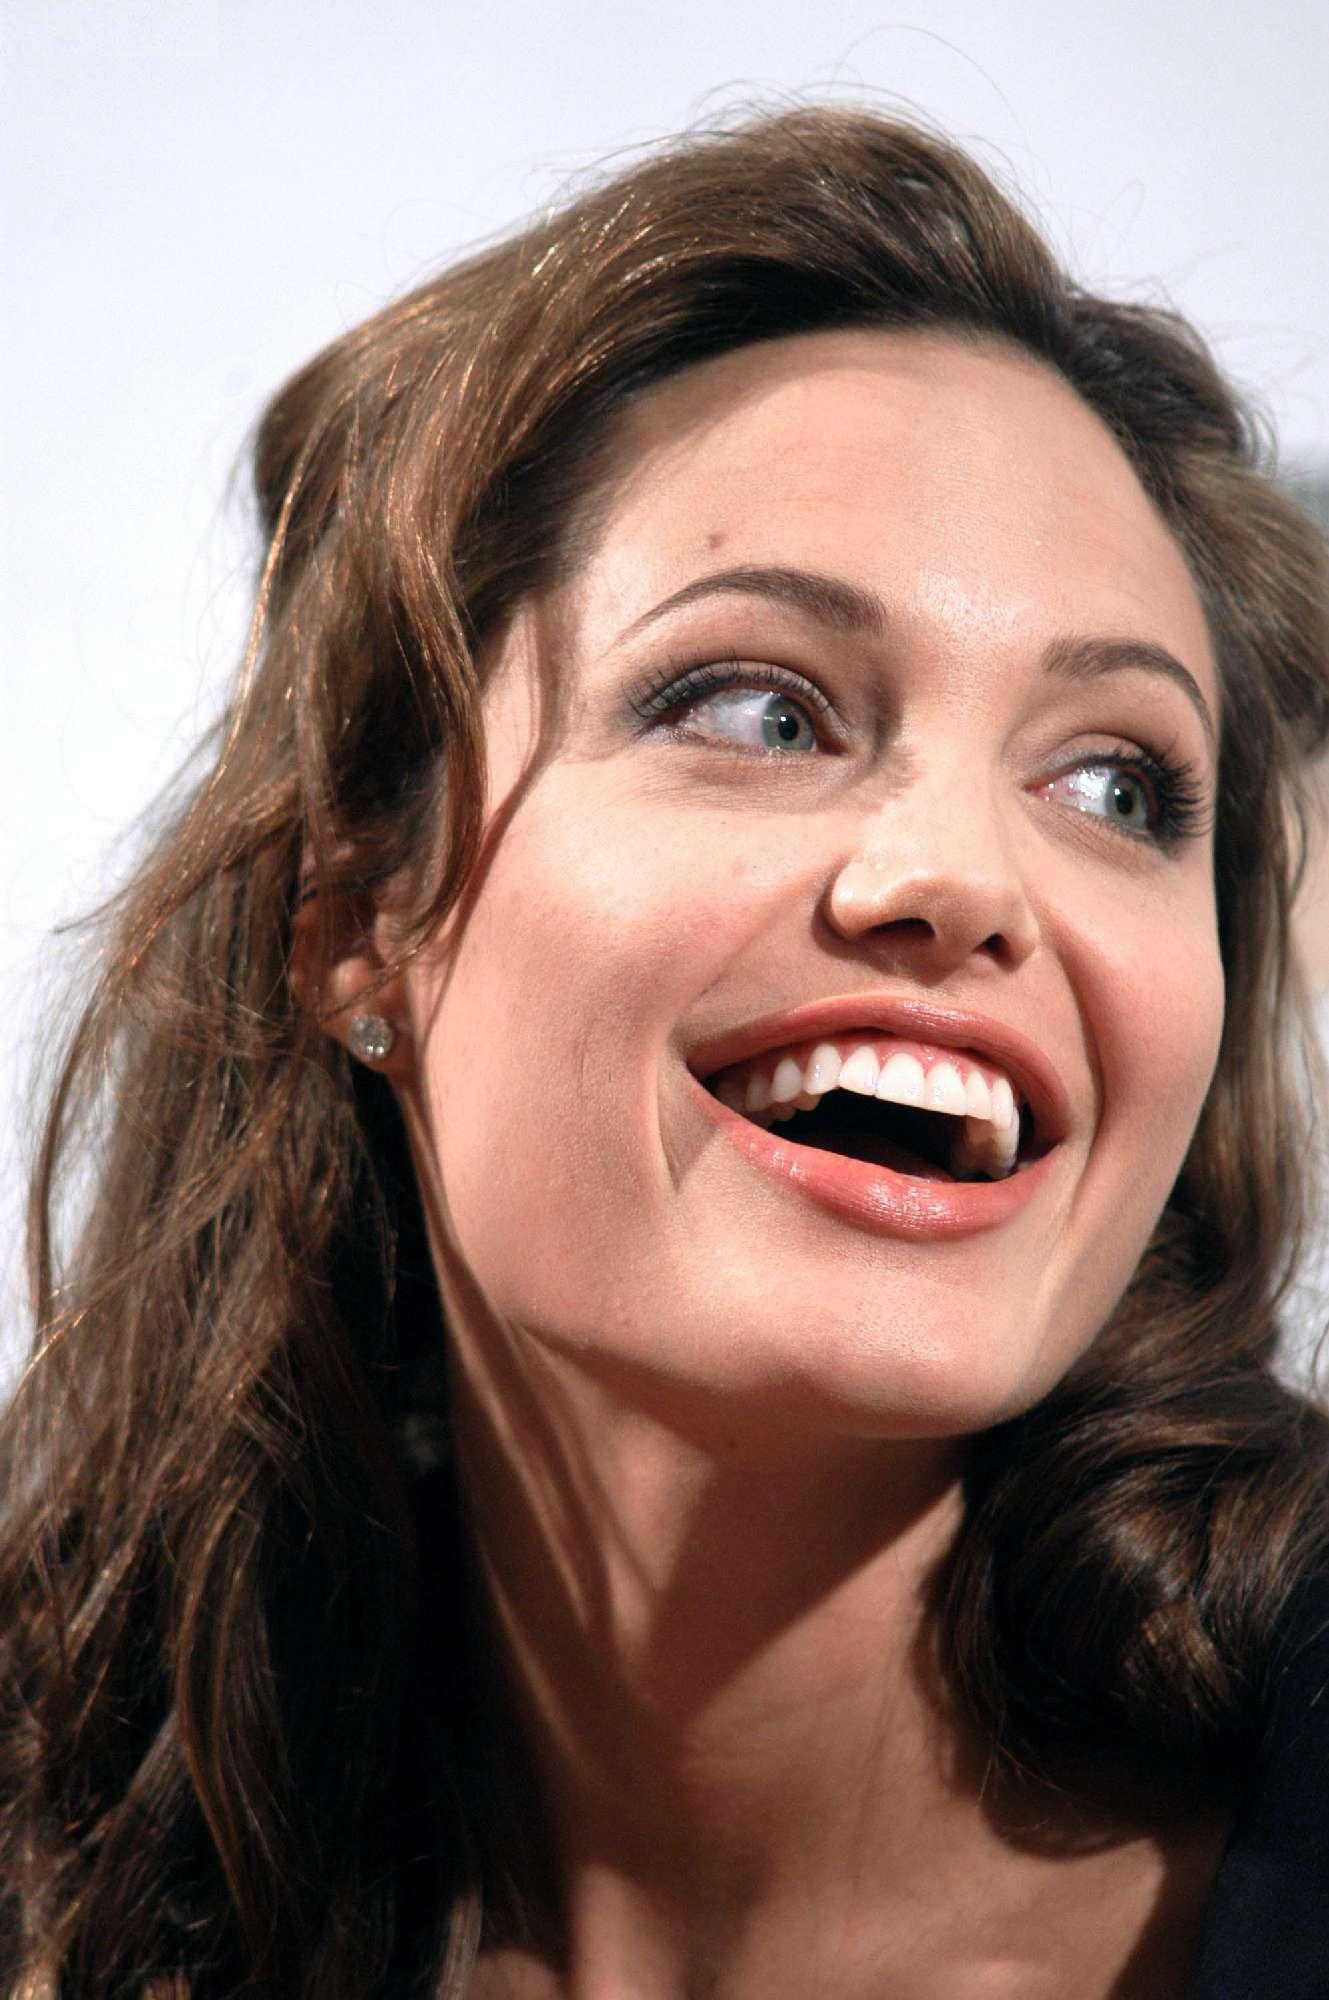 Angelina Jolie Photo 732 Of 3411 Pics Wallpaper Photo